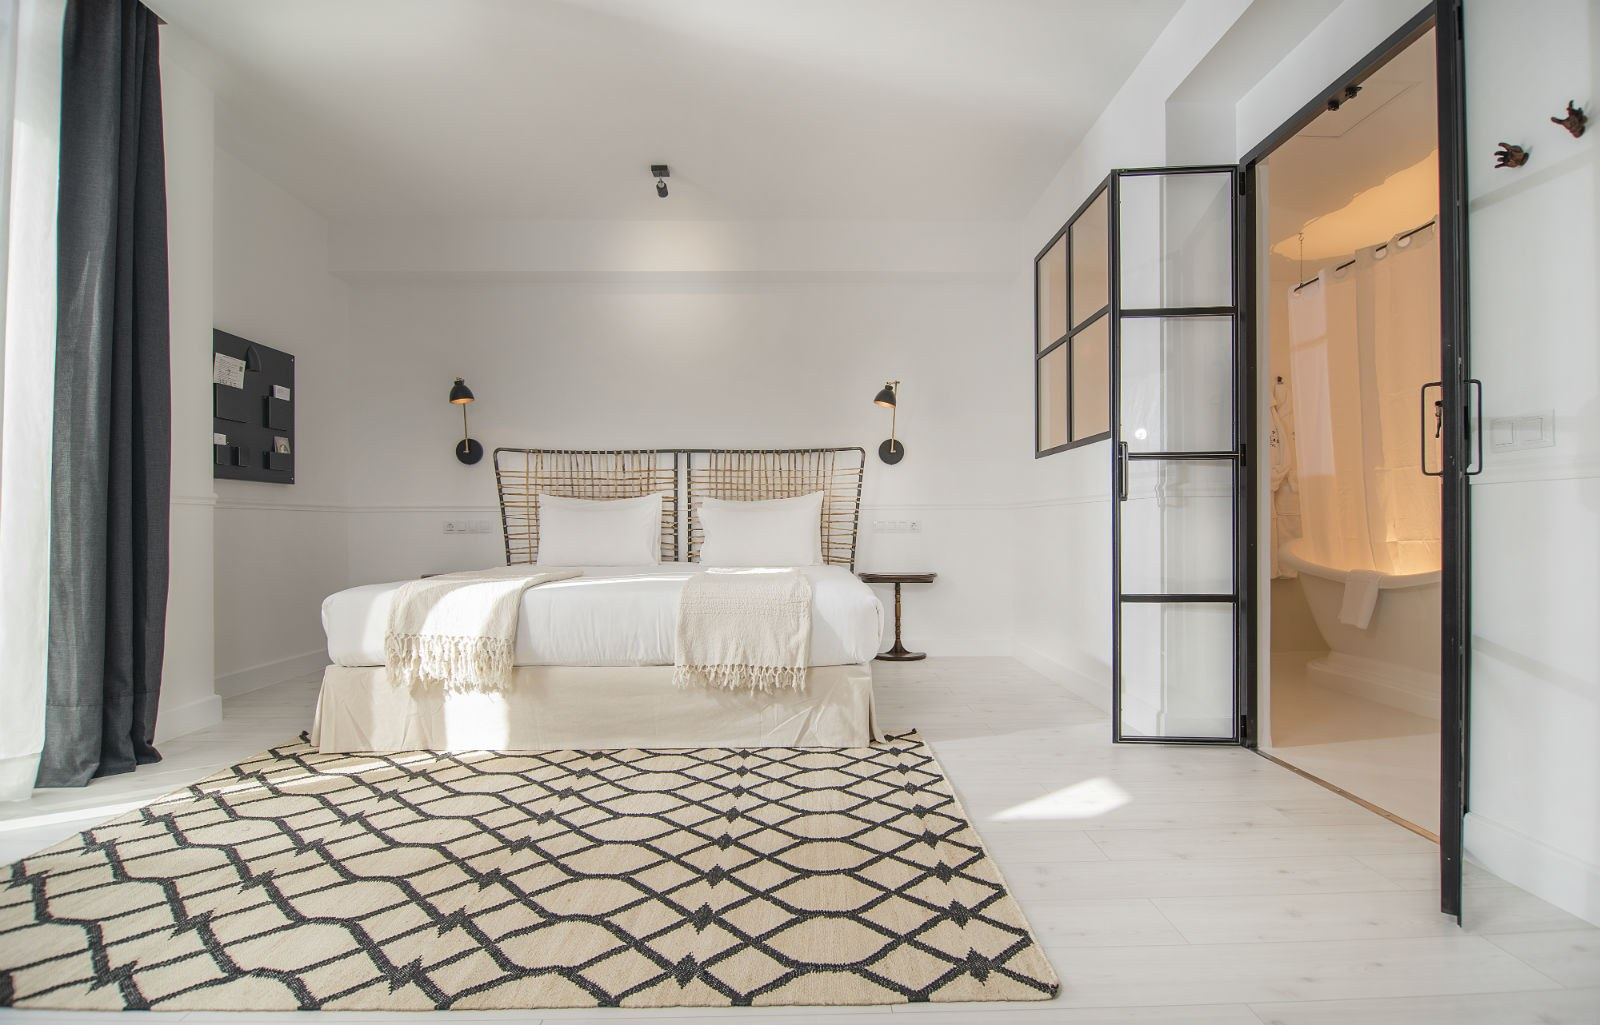 Hotel siete islas barat simo - Hotel siete islas madrid ...